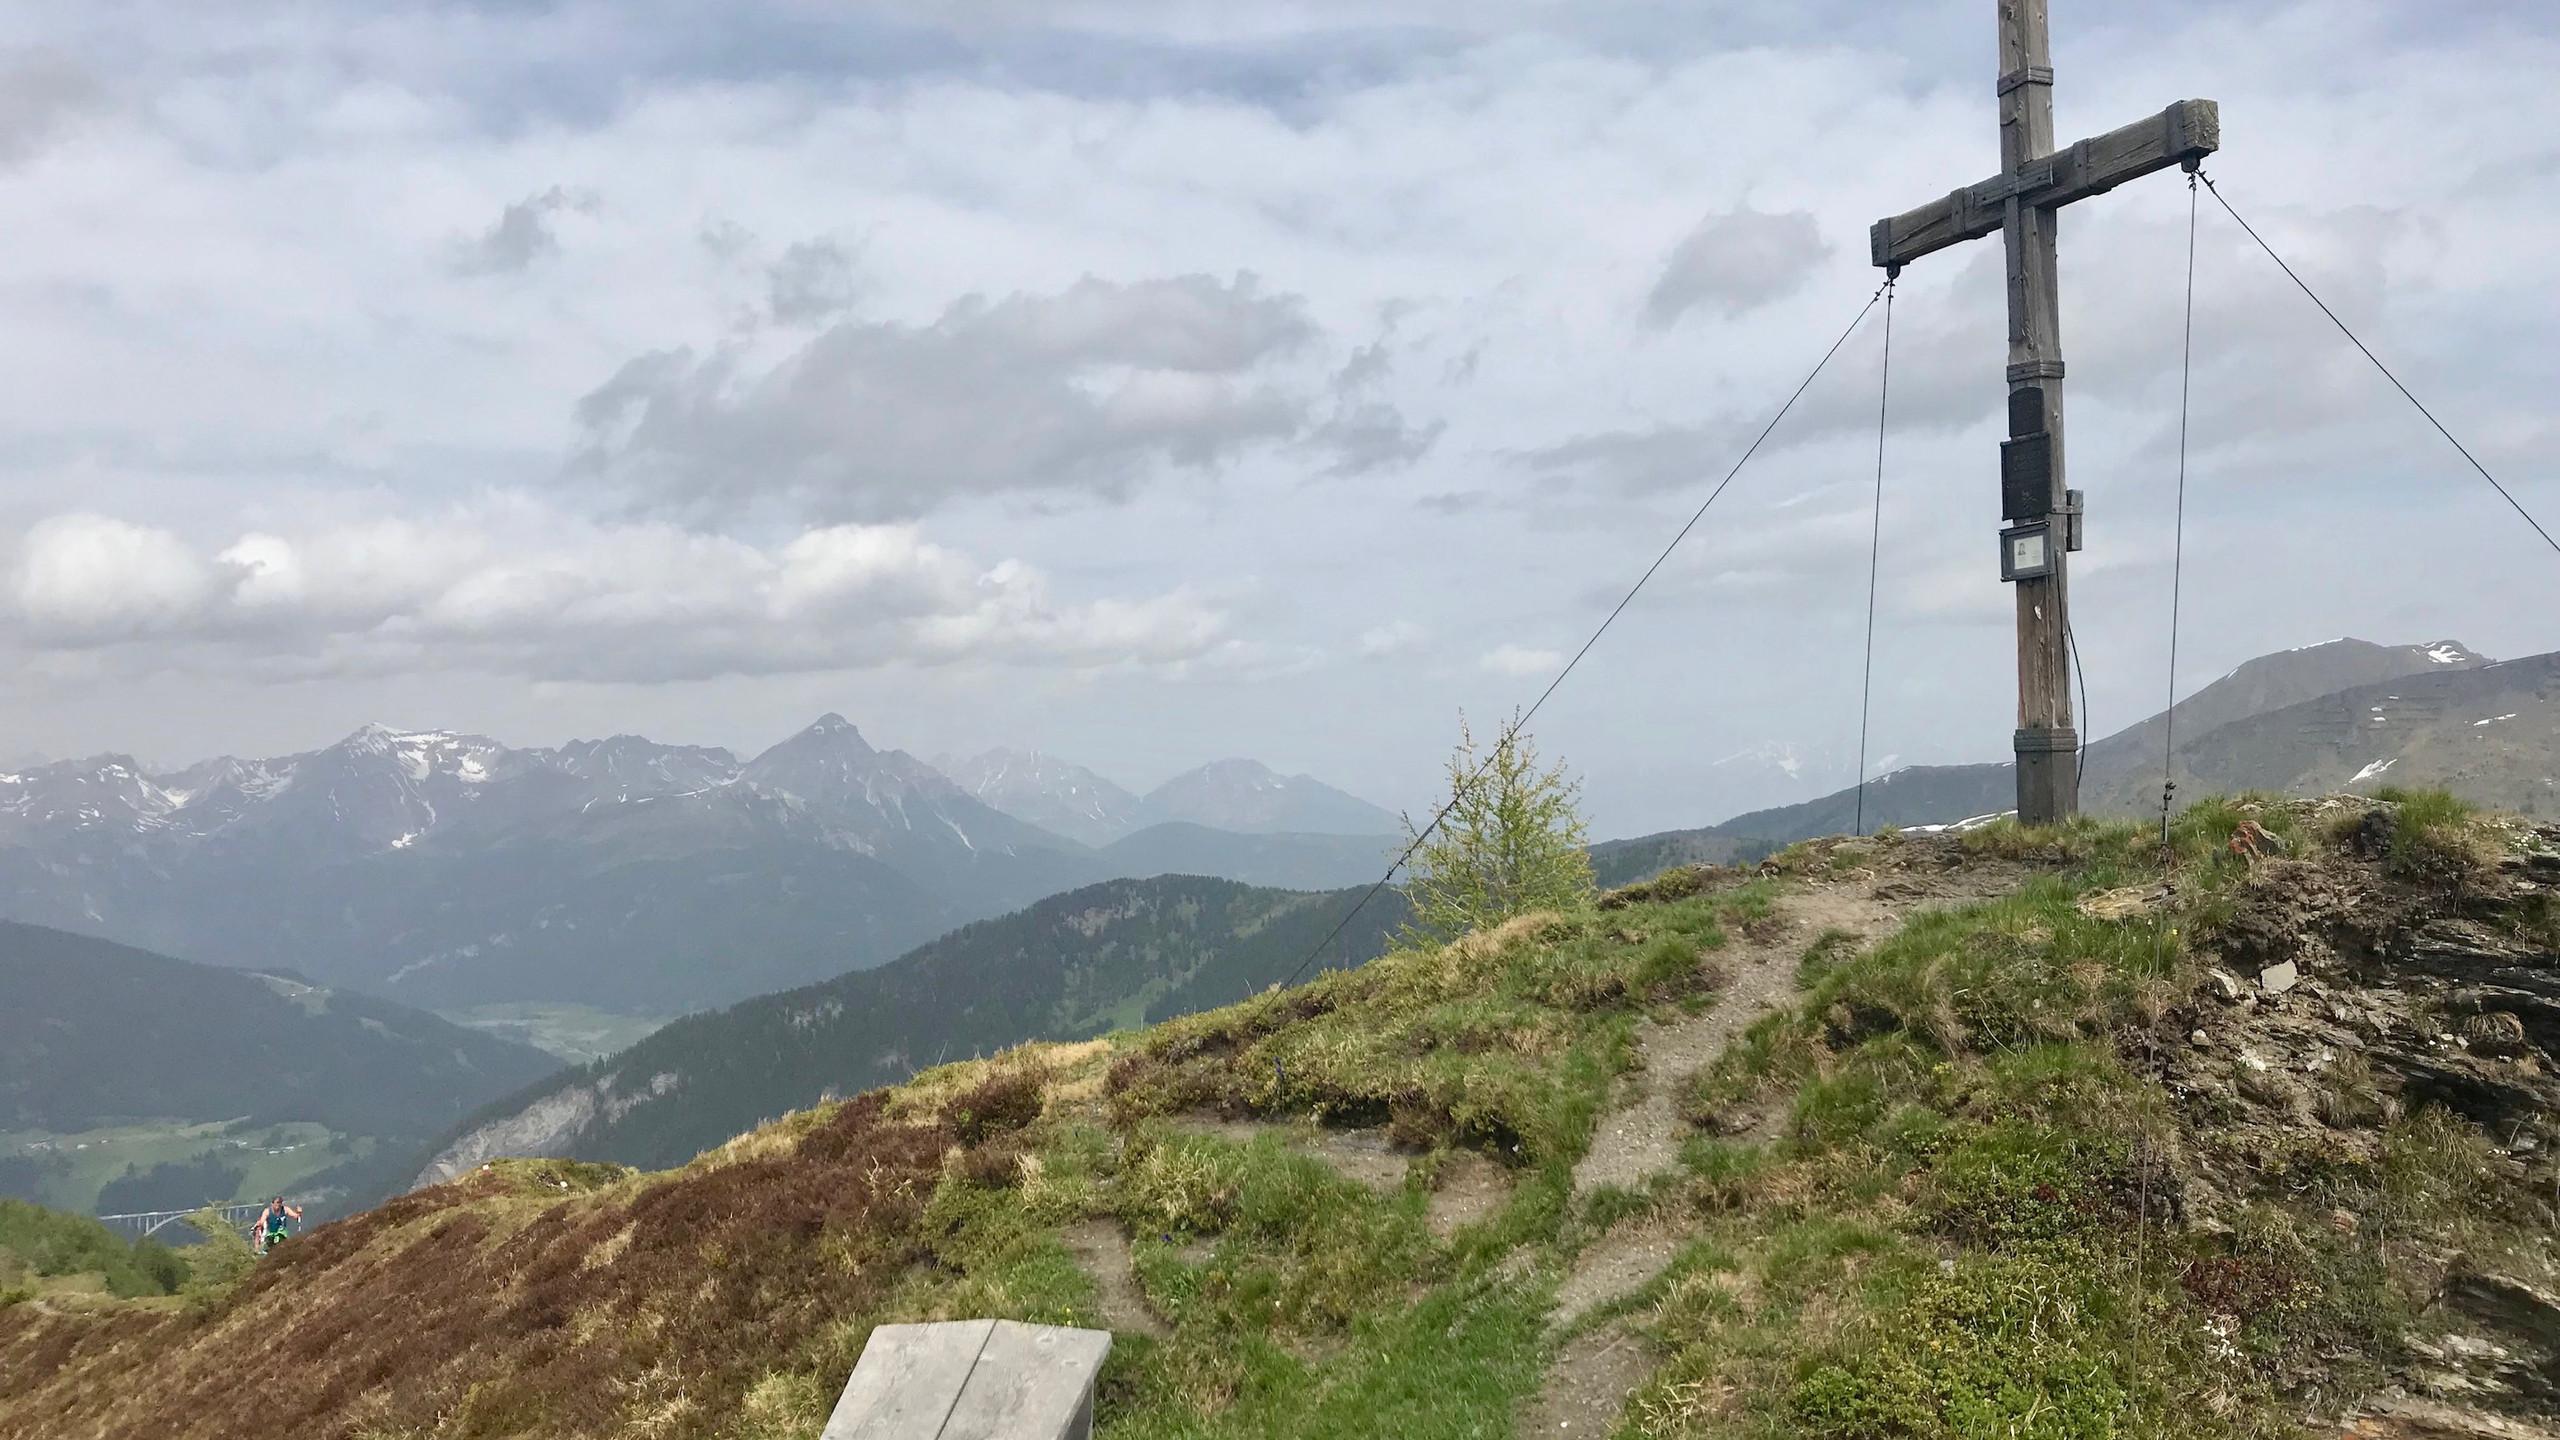 Gipfelkreuz Ottenspitze, Biketour Schmirntal